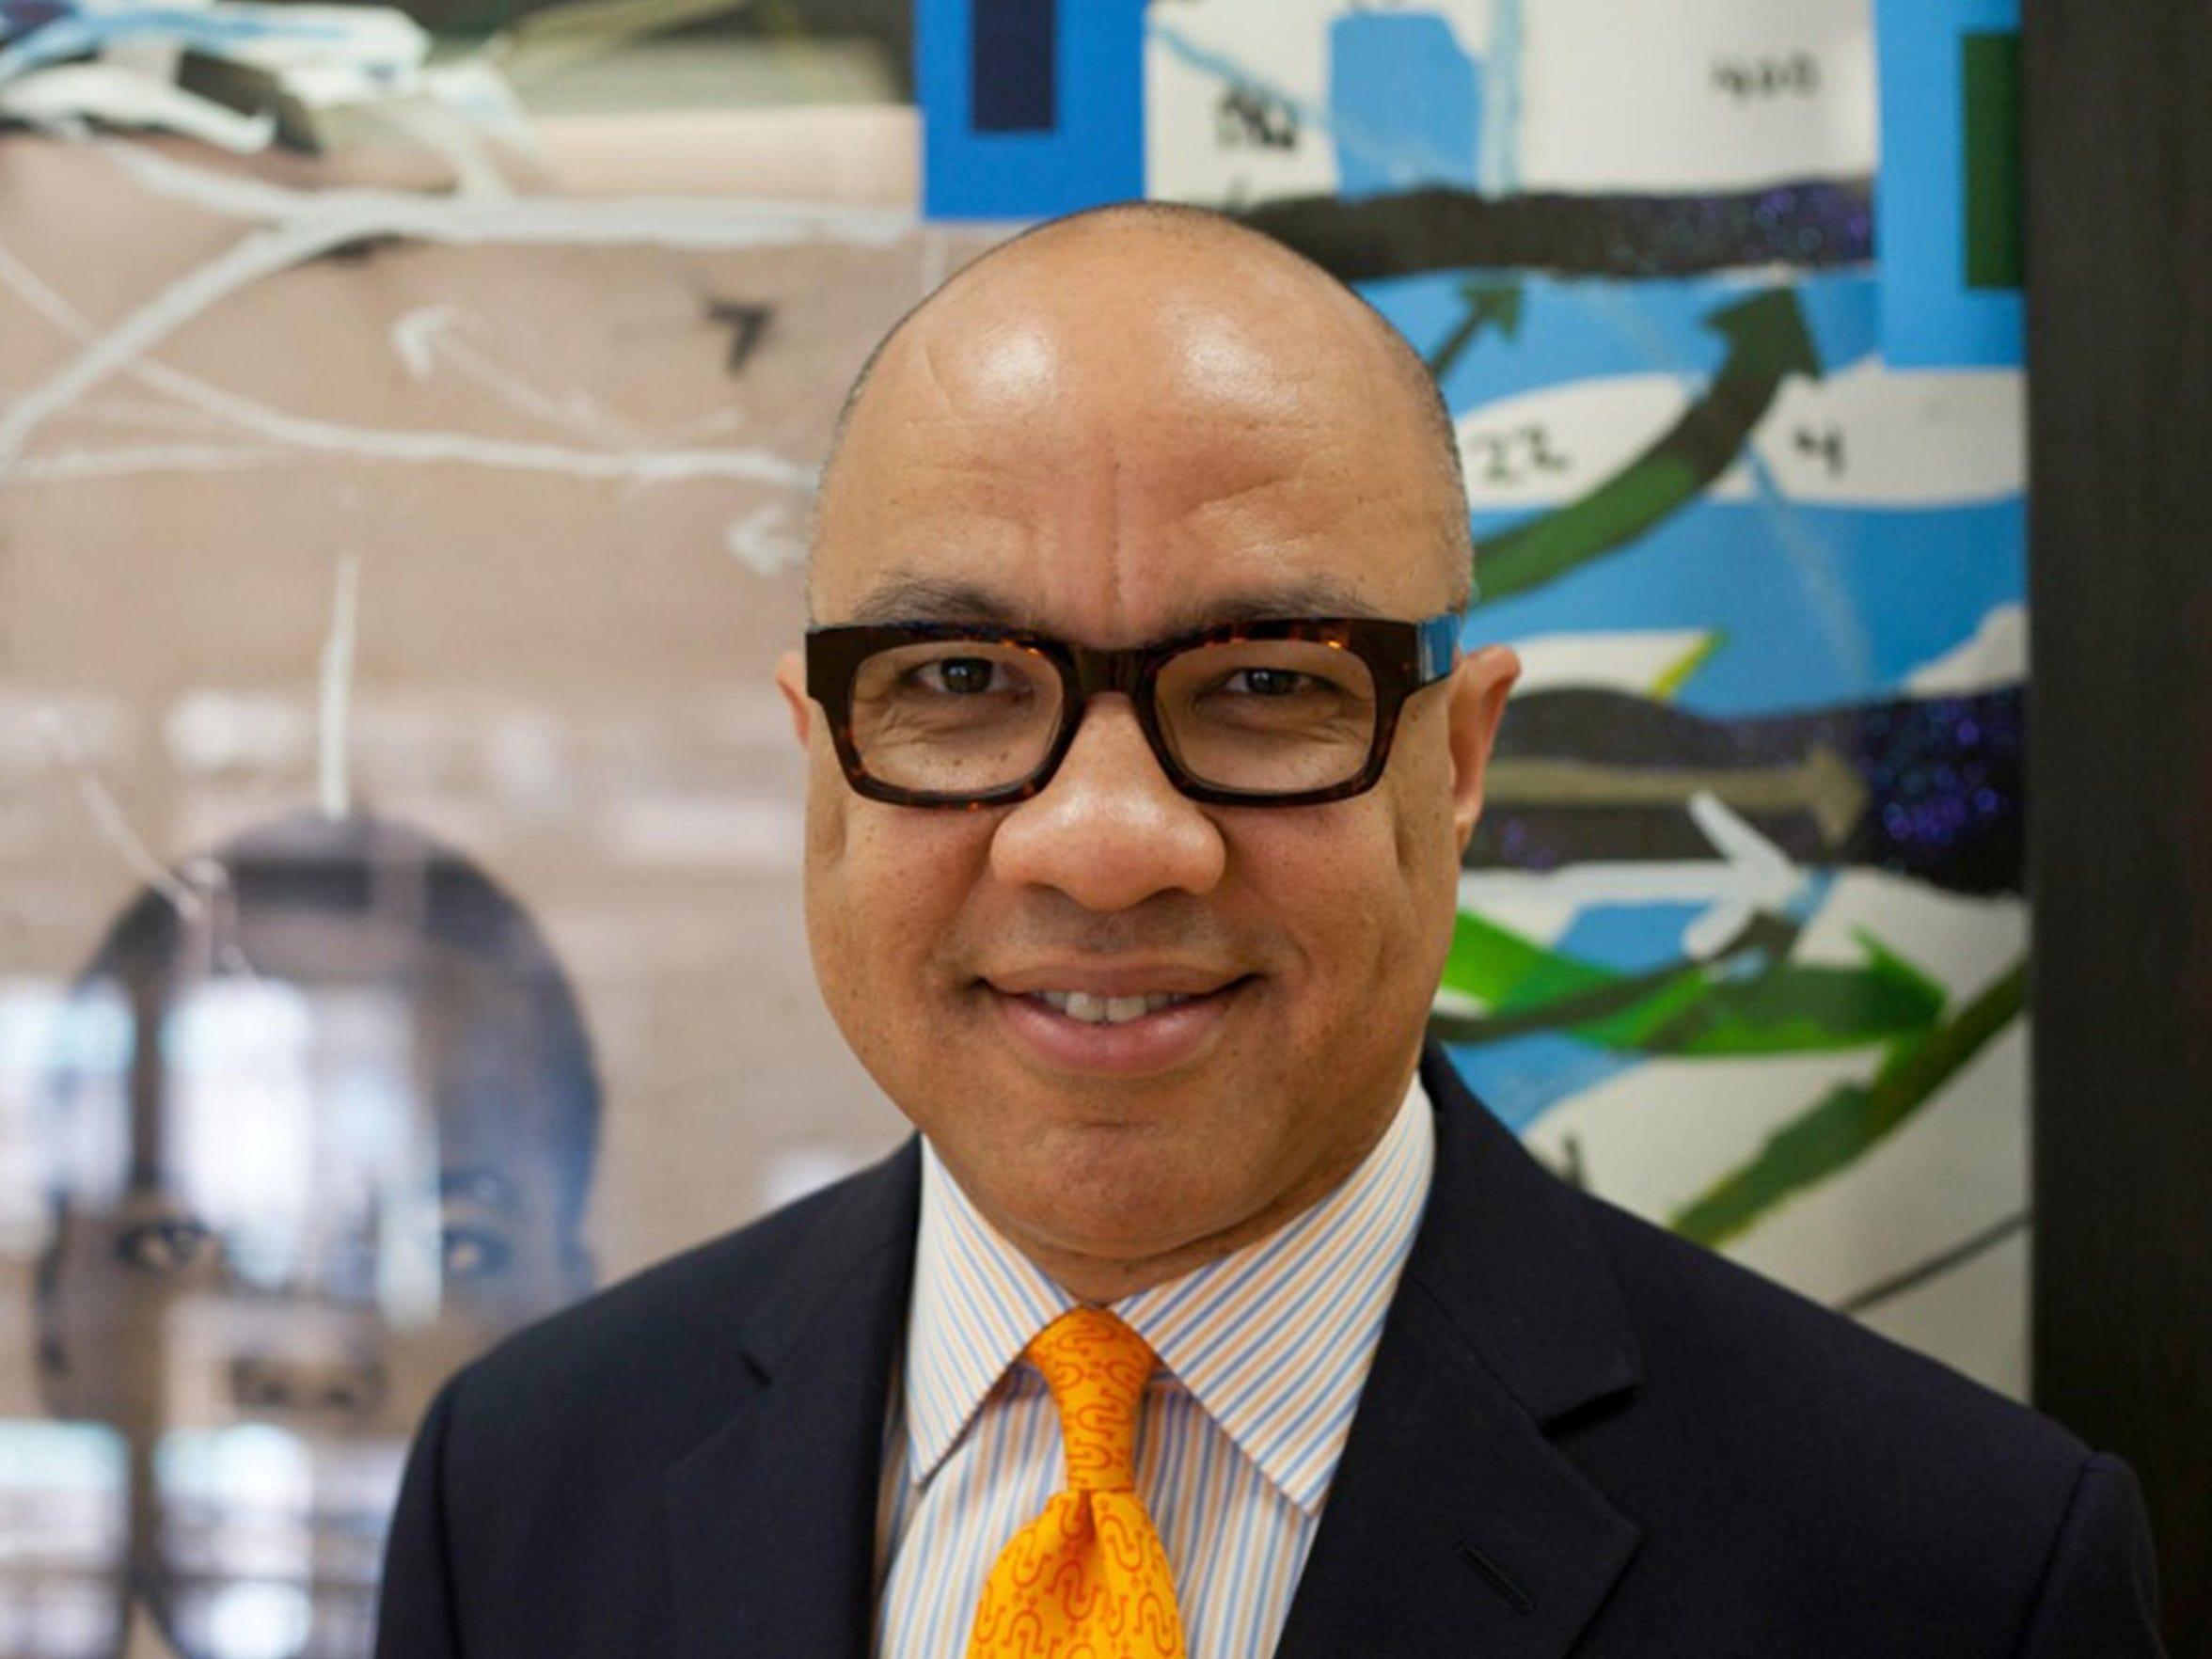 Darren Walker, president of the Ford Foundation.